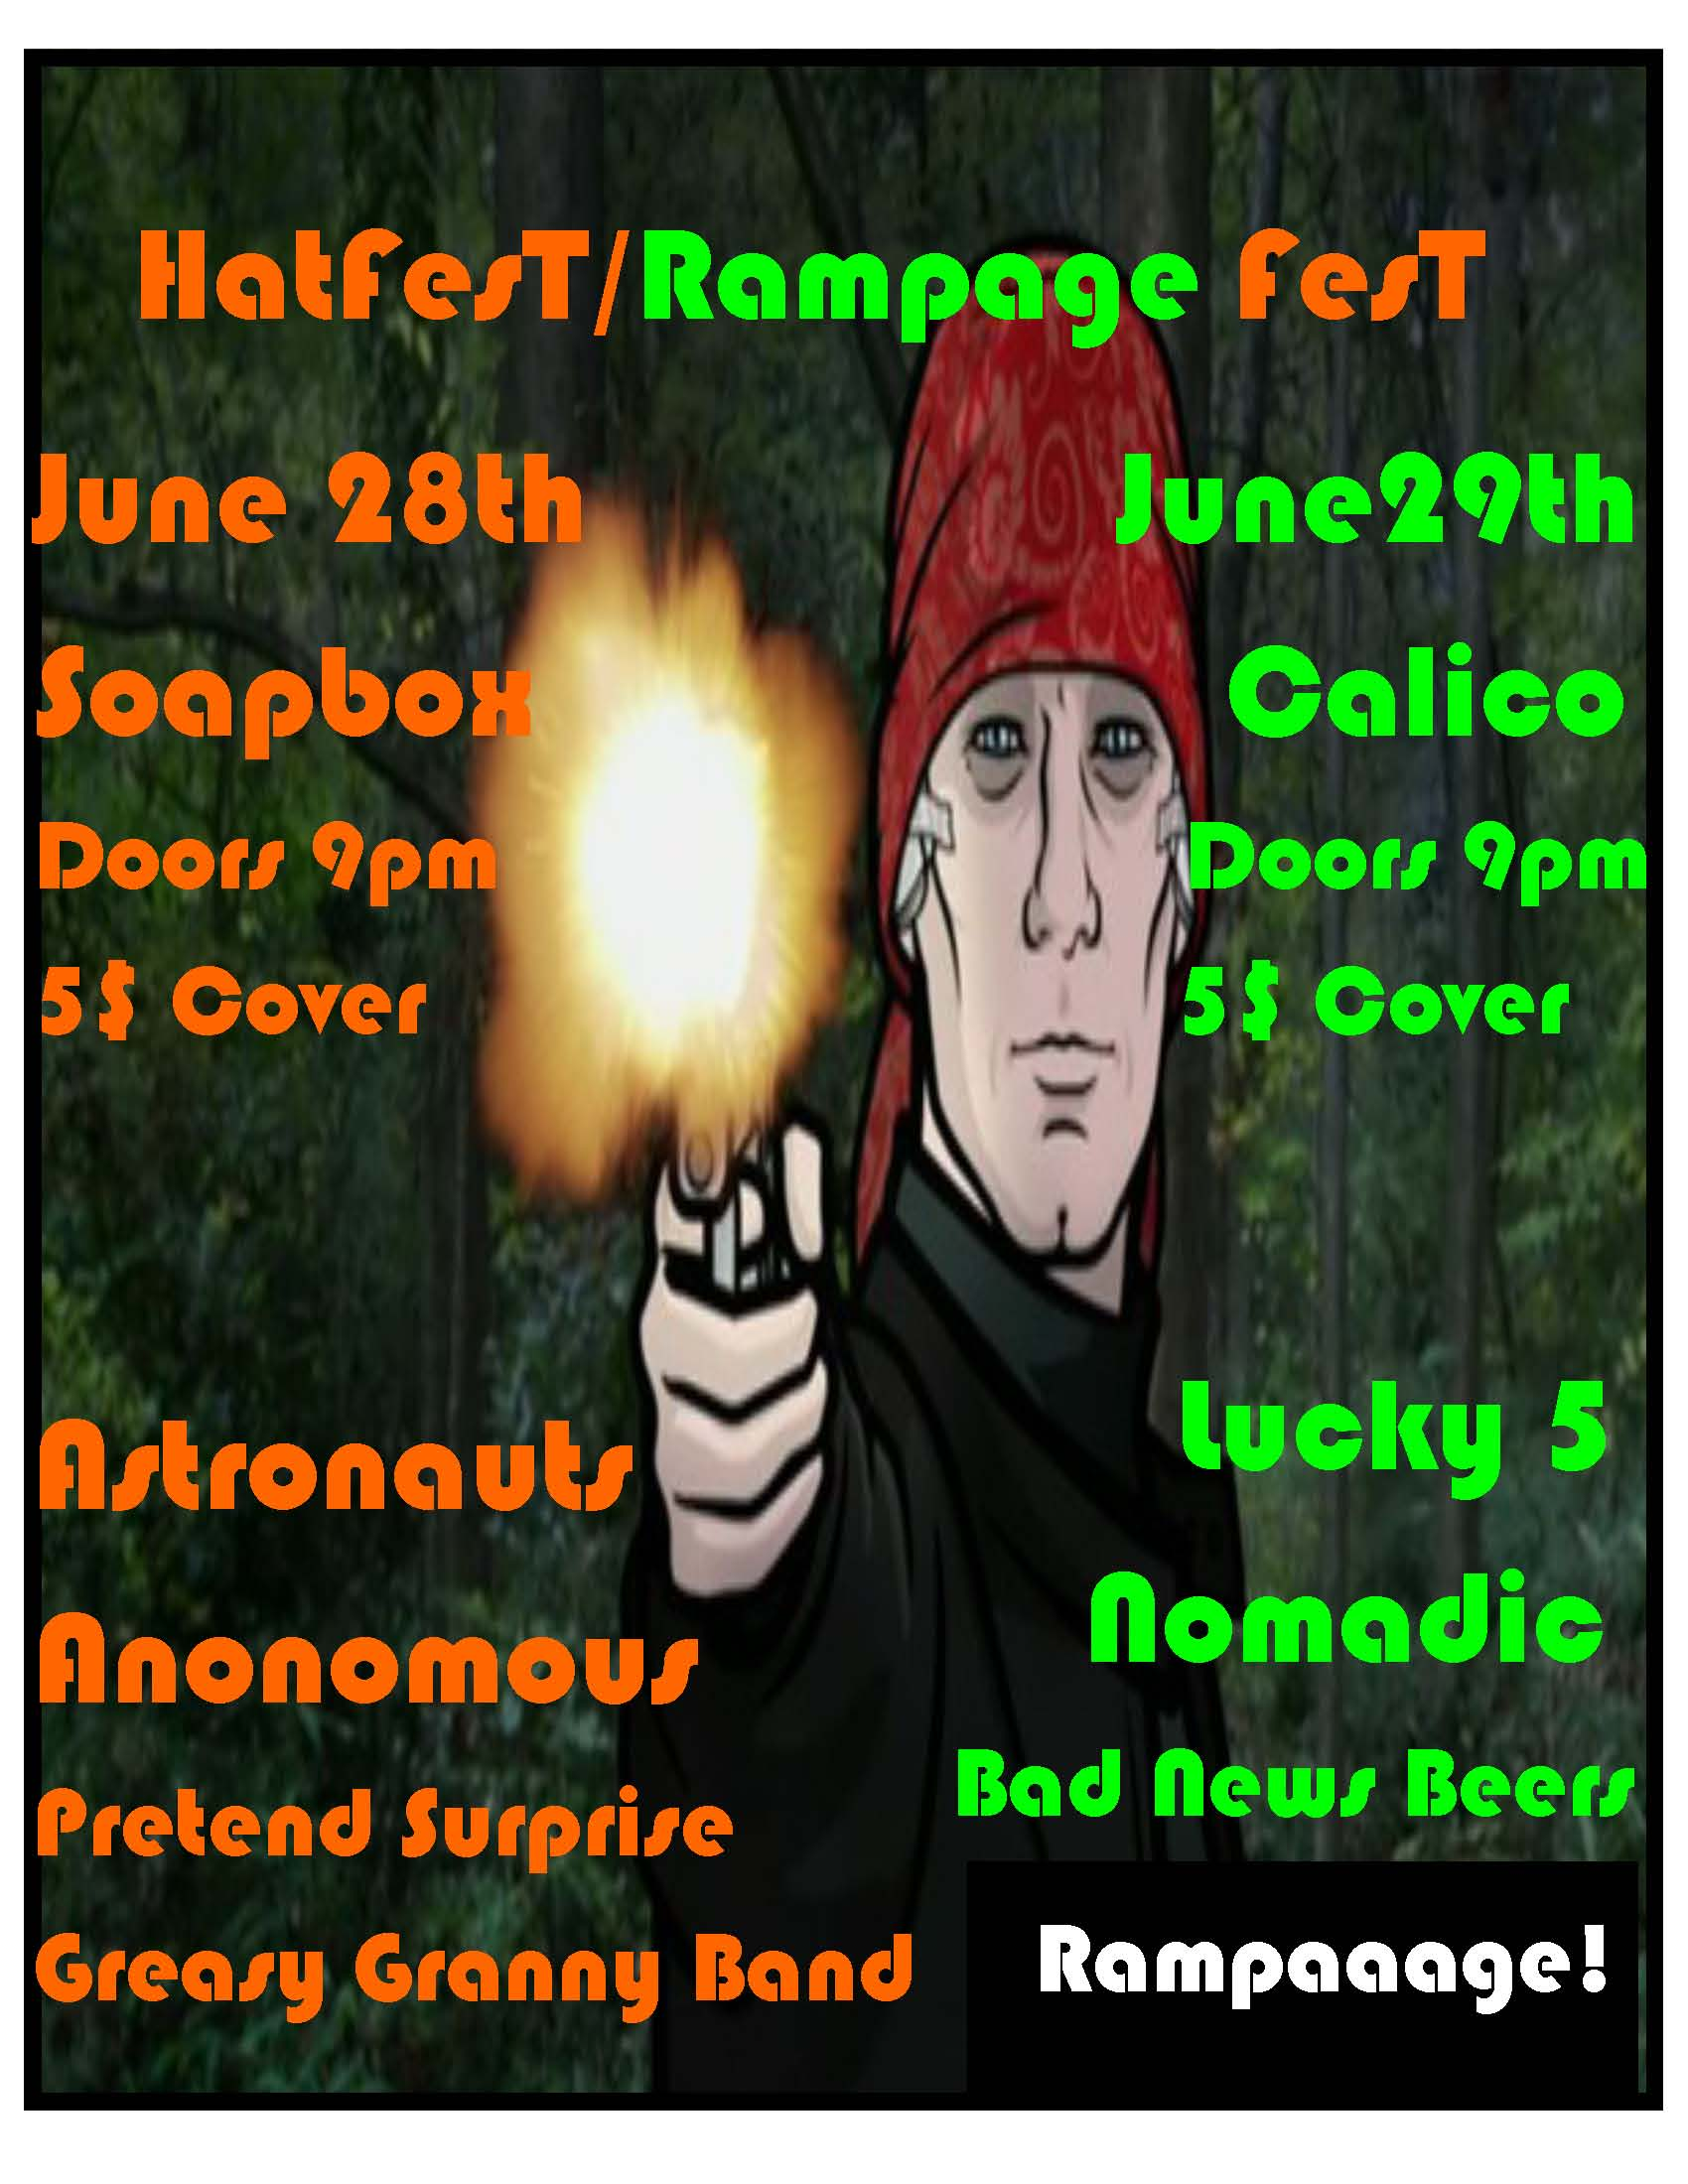 Hatfest Rampage fest posterpic